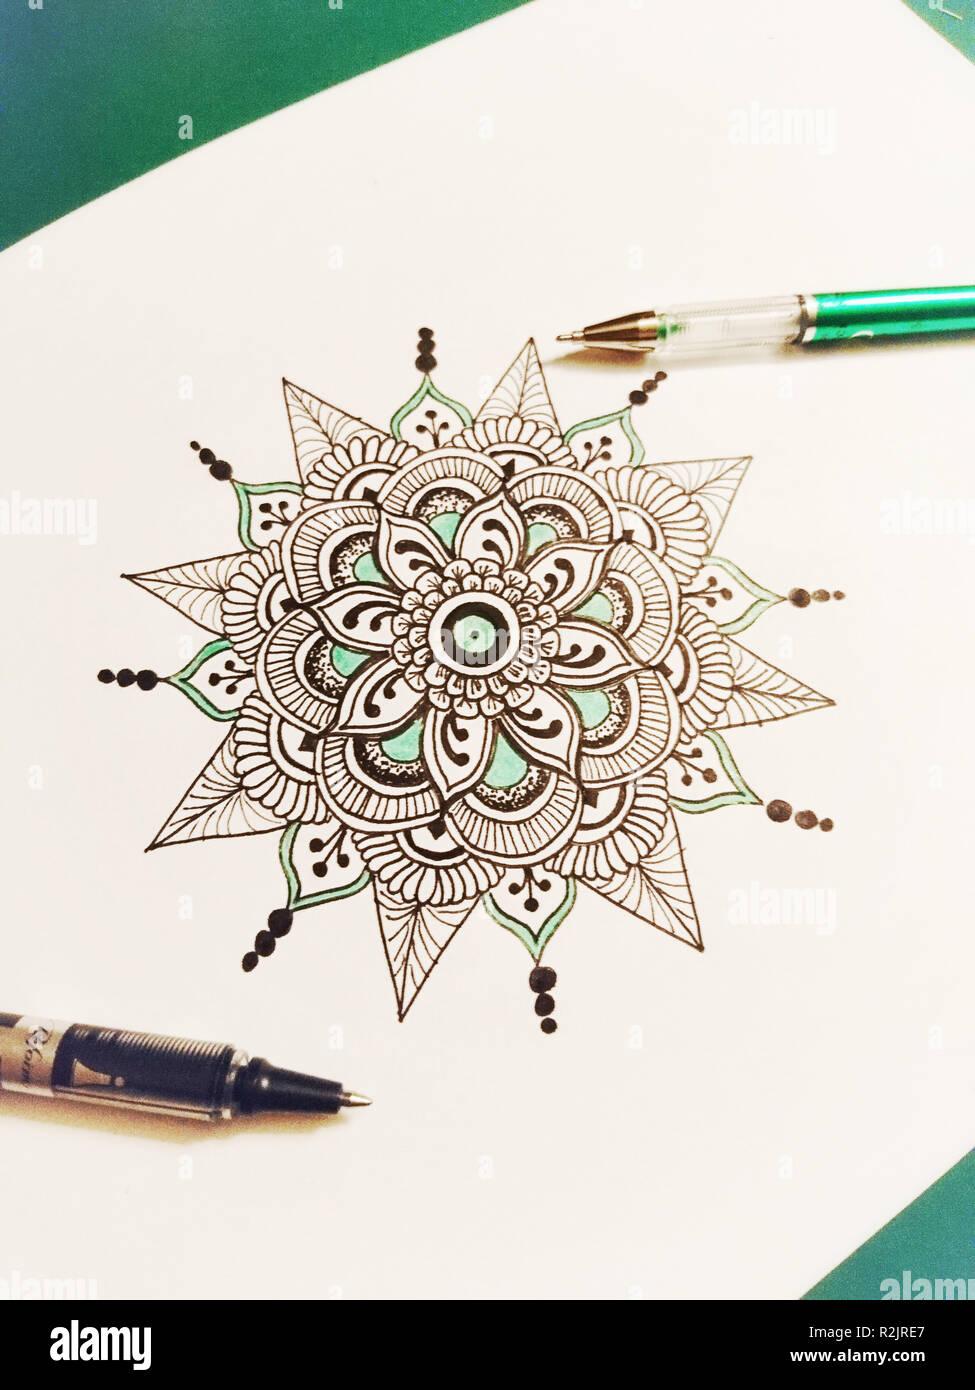 Bricolaje Dibujo Mandala Lápices Foto Imagen De Stock